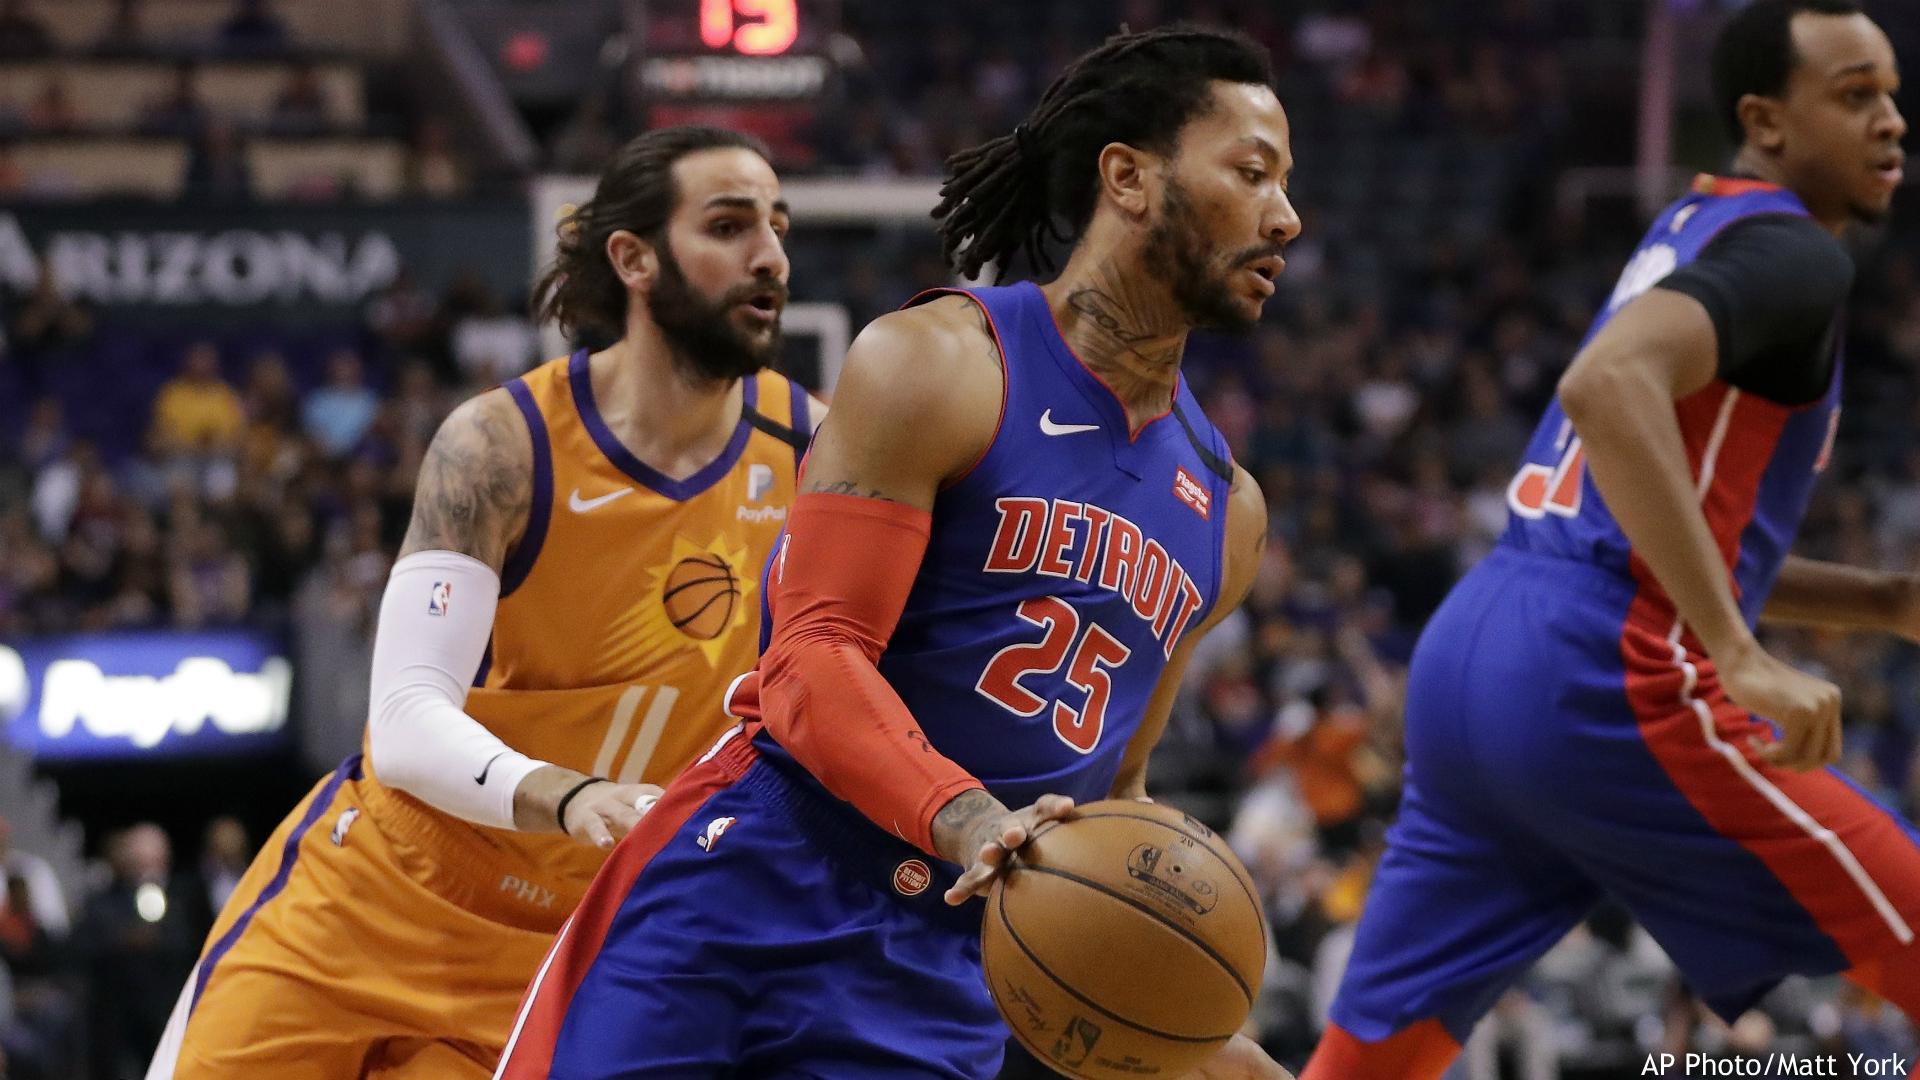 Detroit Pistons guard Derrick Rose (25) slips past Phoenix Suns guard Ricky Rubio (11) during the first half of an NBA game, Friday, Feb. 28, 2020, in Phoenix. (AP Photo/Matt York)